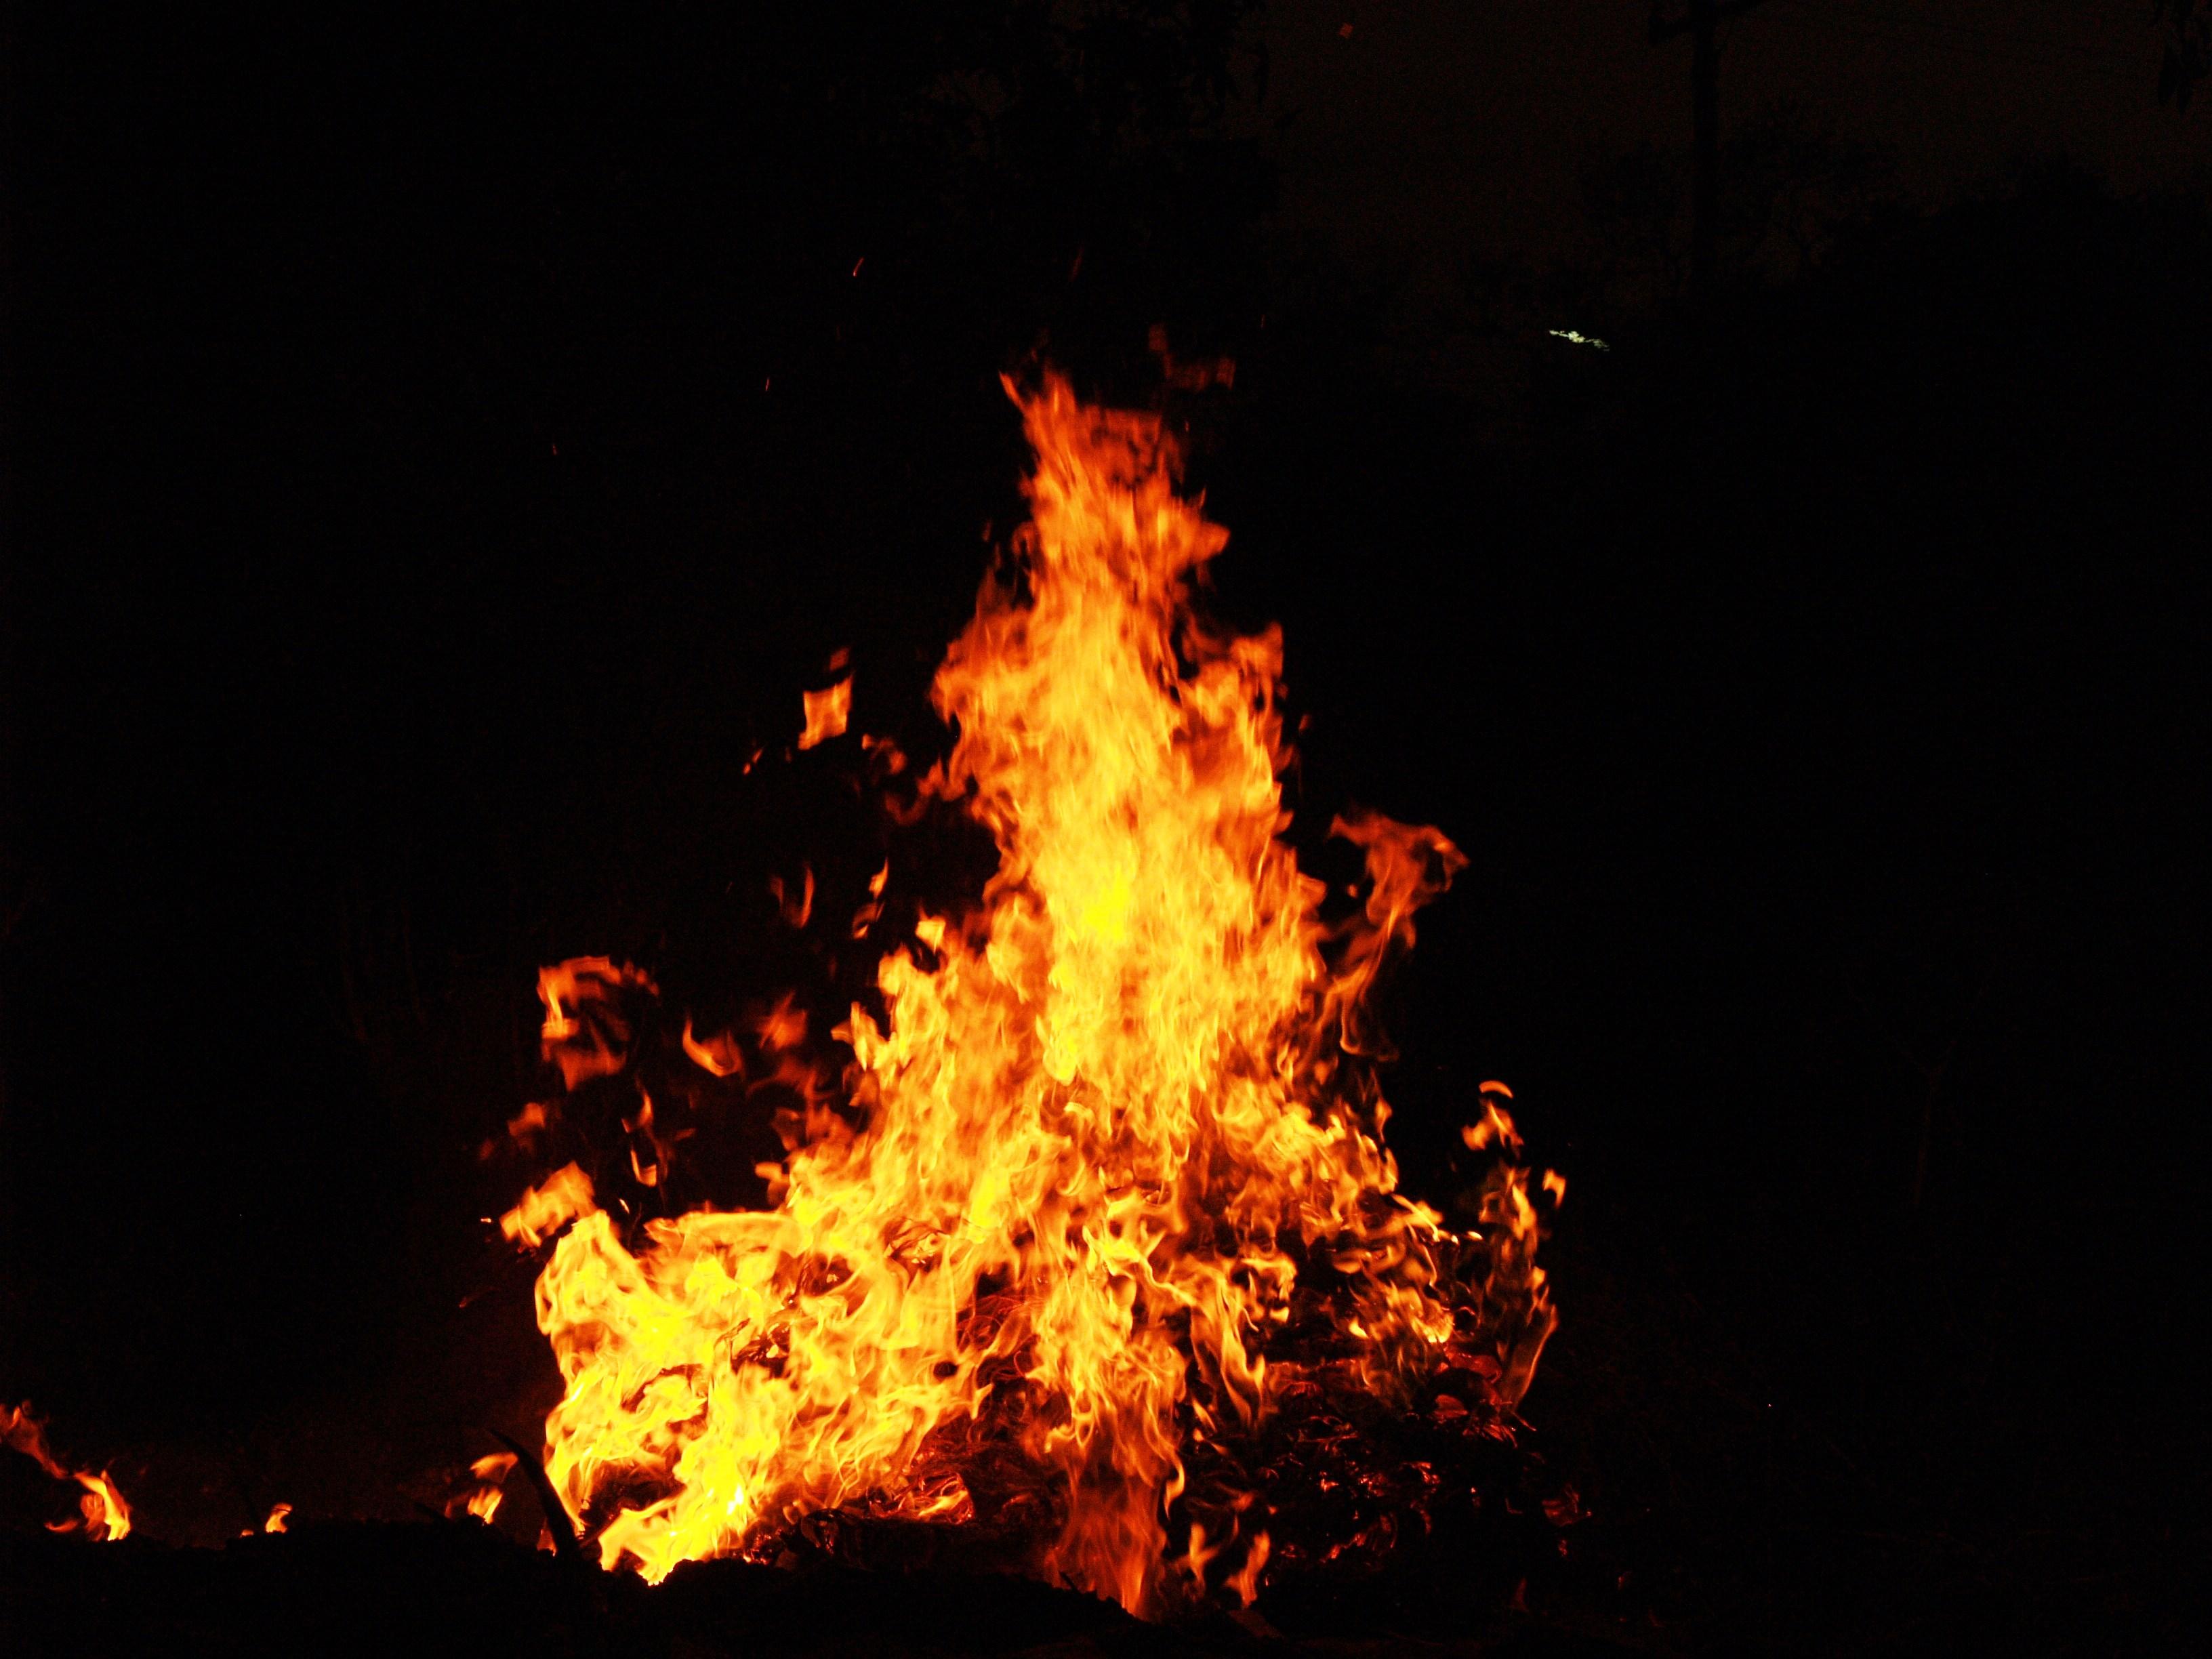 All White Iphone Wallpaper Free Stock Photo Of Burning Dark Fire